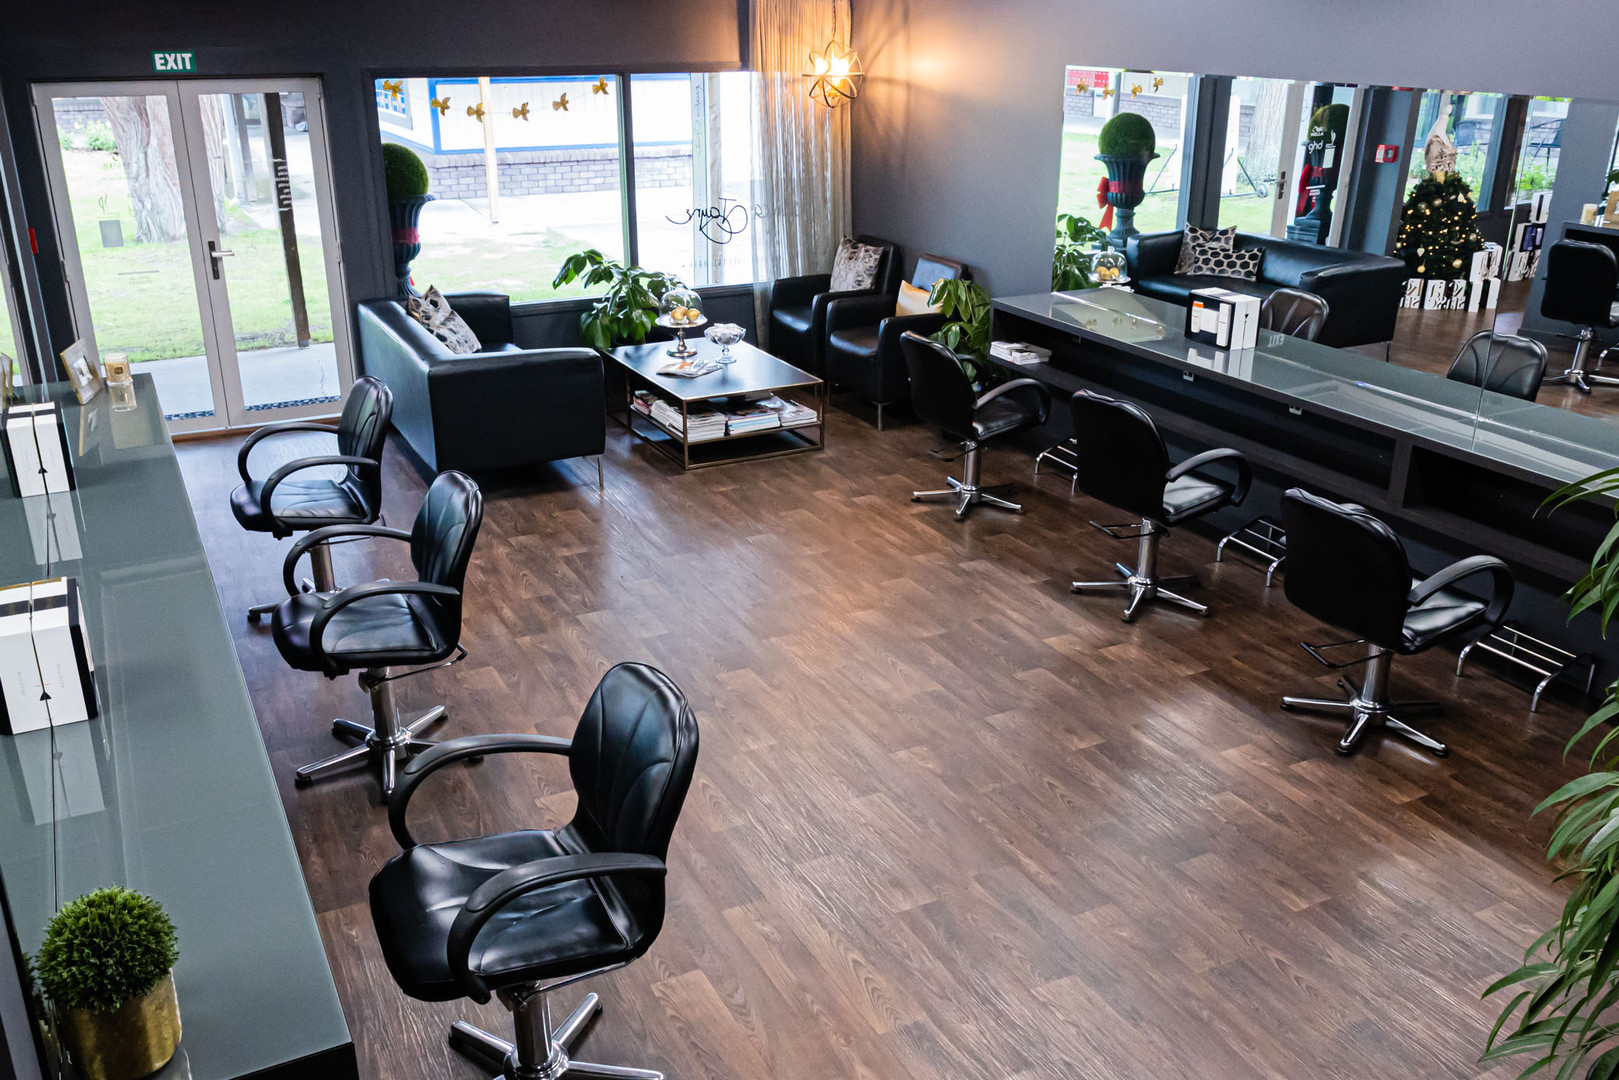 veronica-jayne-salon-selects_AKRU2608.jp